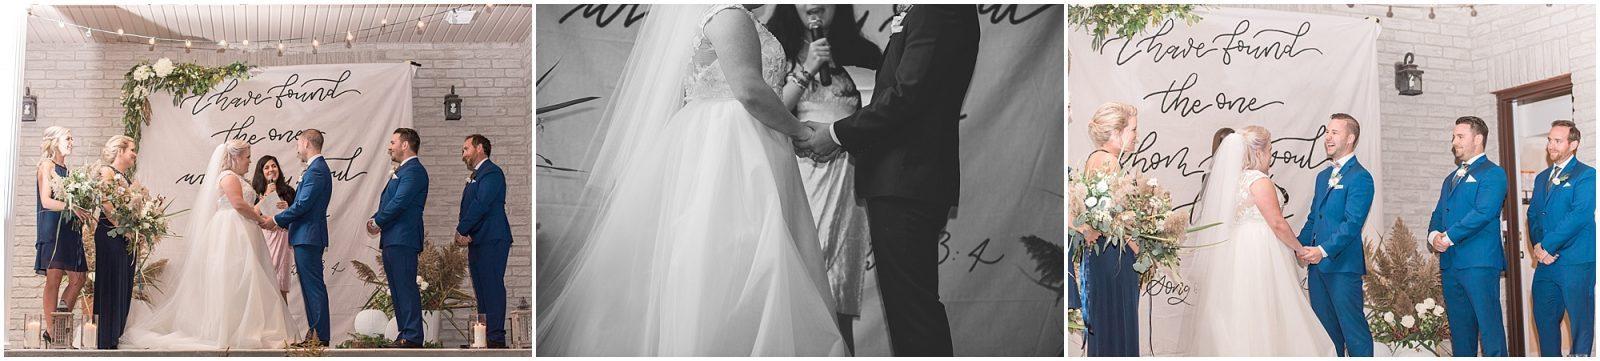 0096 Bethany and Luc - Fall Backyard Ottawa Wedding - Copper and Navy - PhotosbyEmmaH.jpg